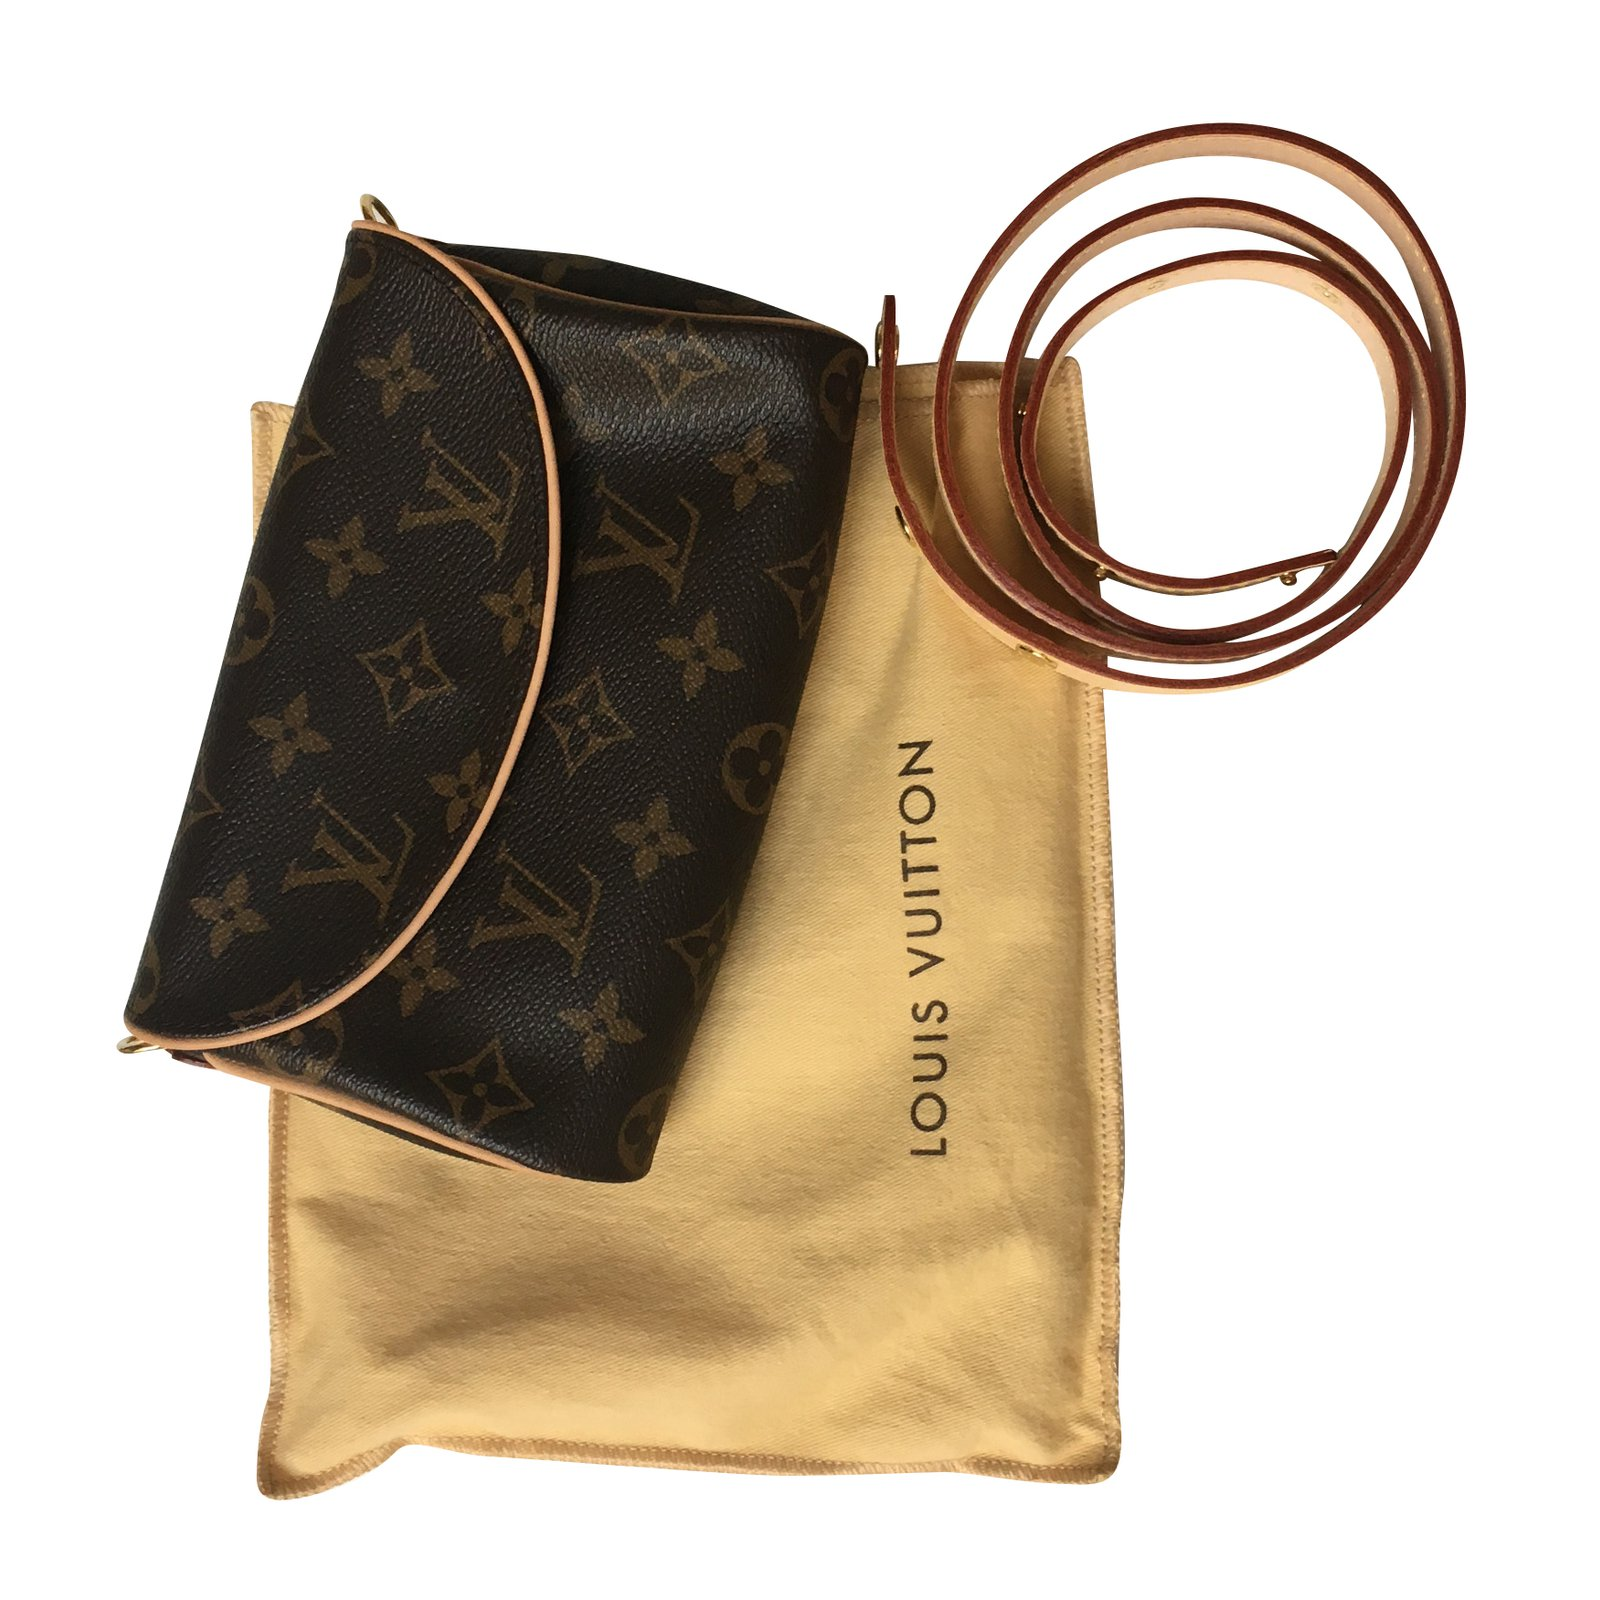 louis vuitton clutch bag. louis vuitton belt clutch bags cloth brown ref.40846 bag